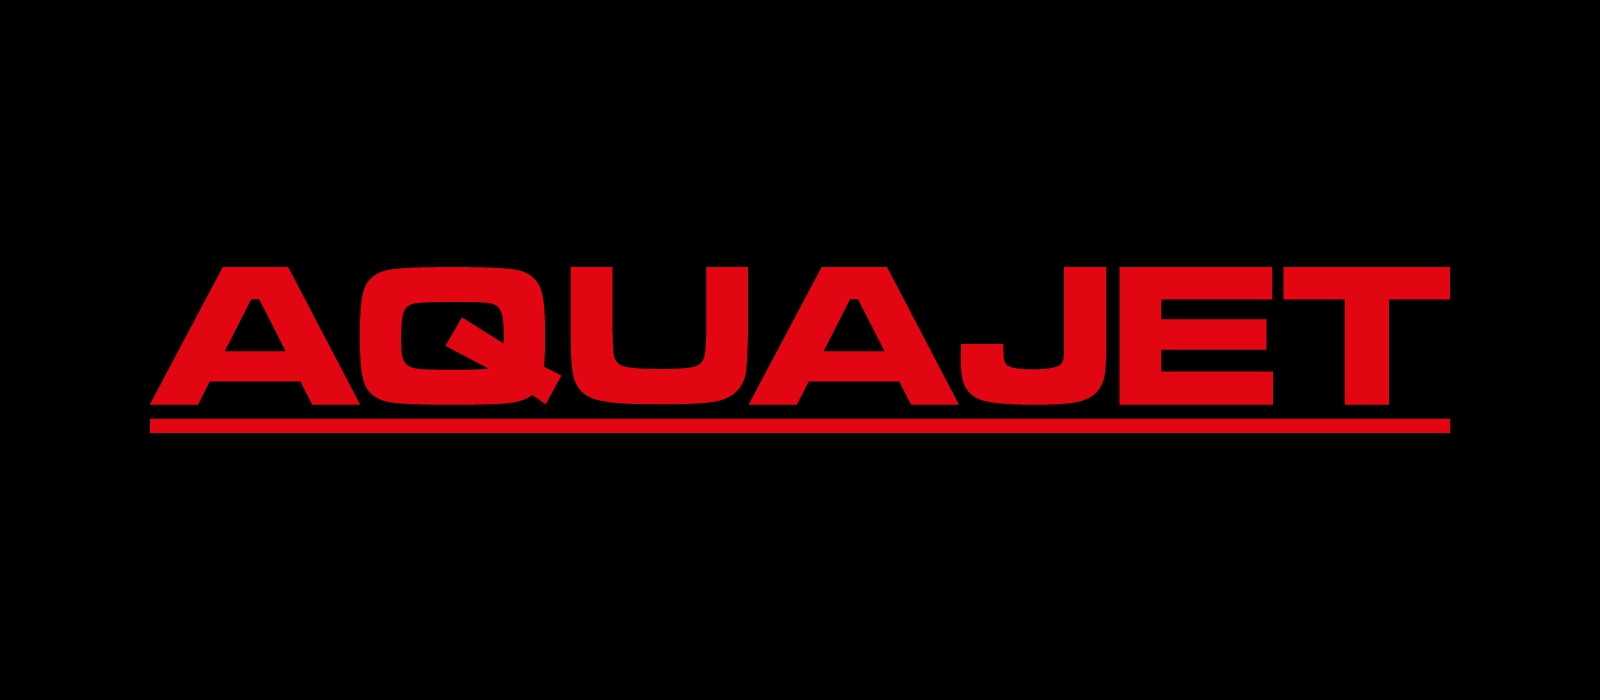 Aquajet logo hydrodemolition